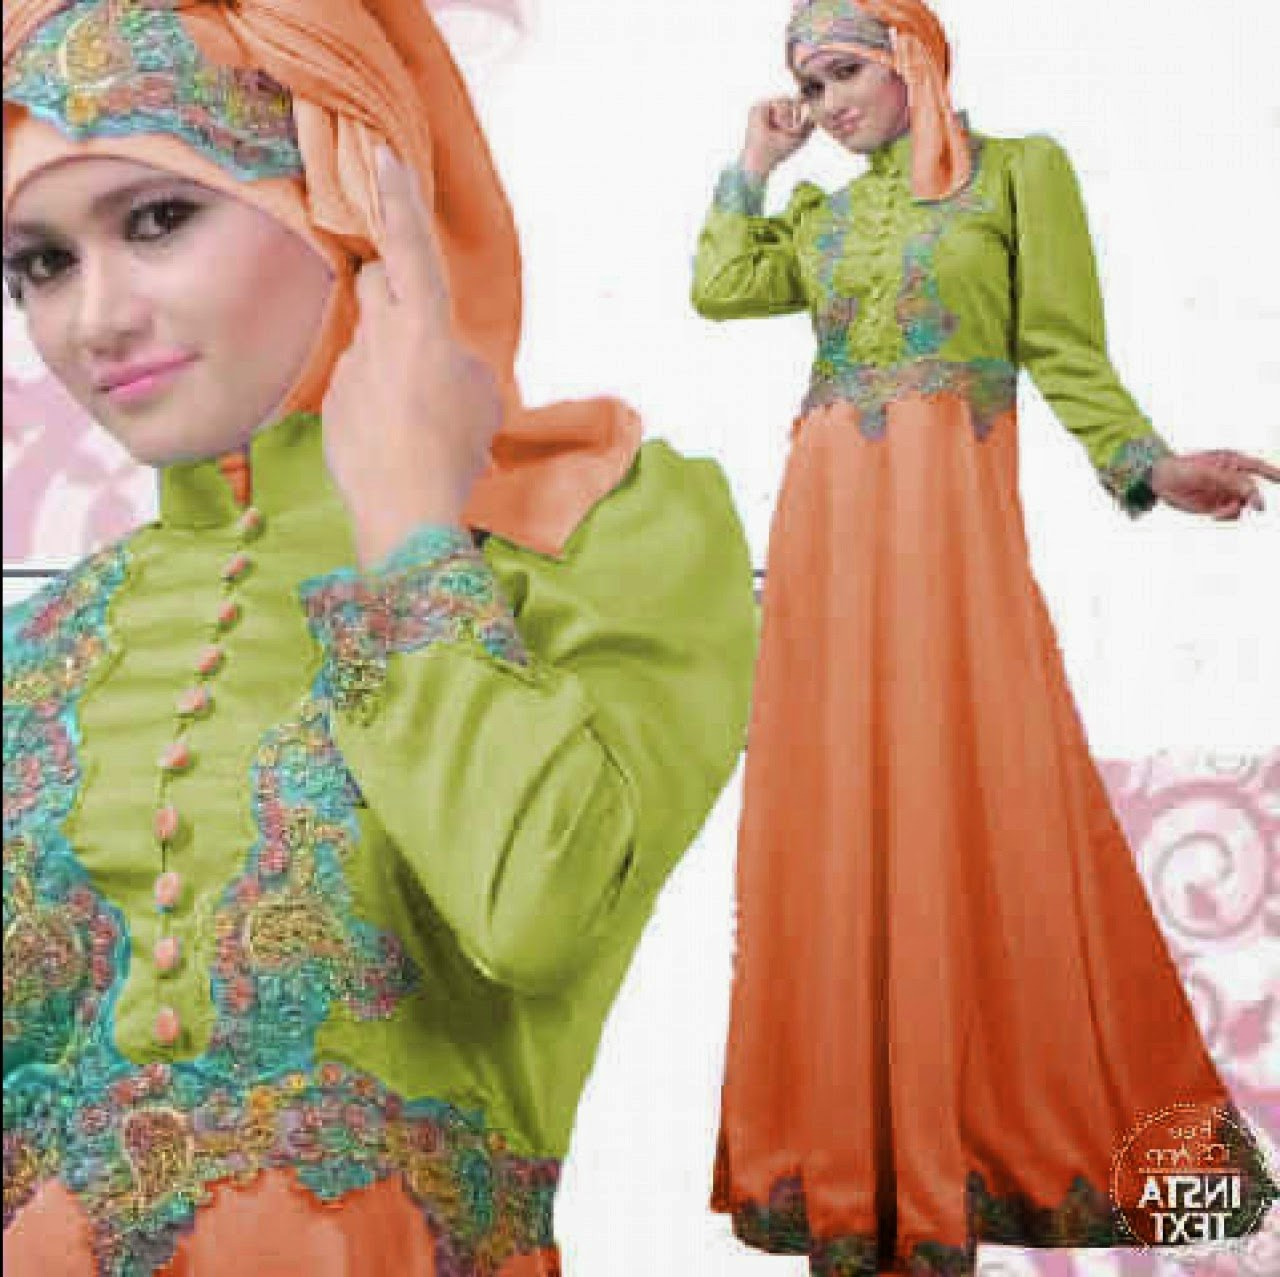 Bentuk Trend Warna Baju Lebaran 2018 Budm Kumpulan Foto Model Baju Kebaya Lebaran Terbaru 2018